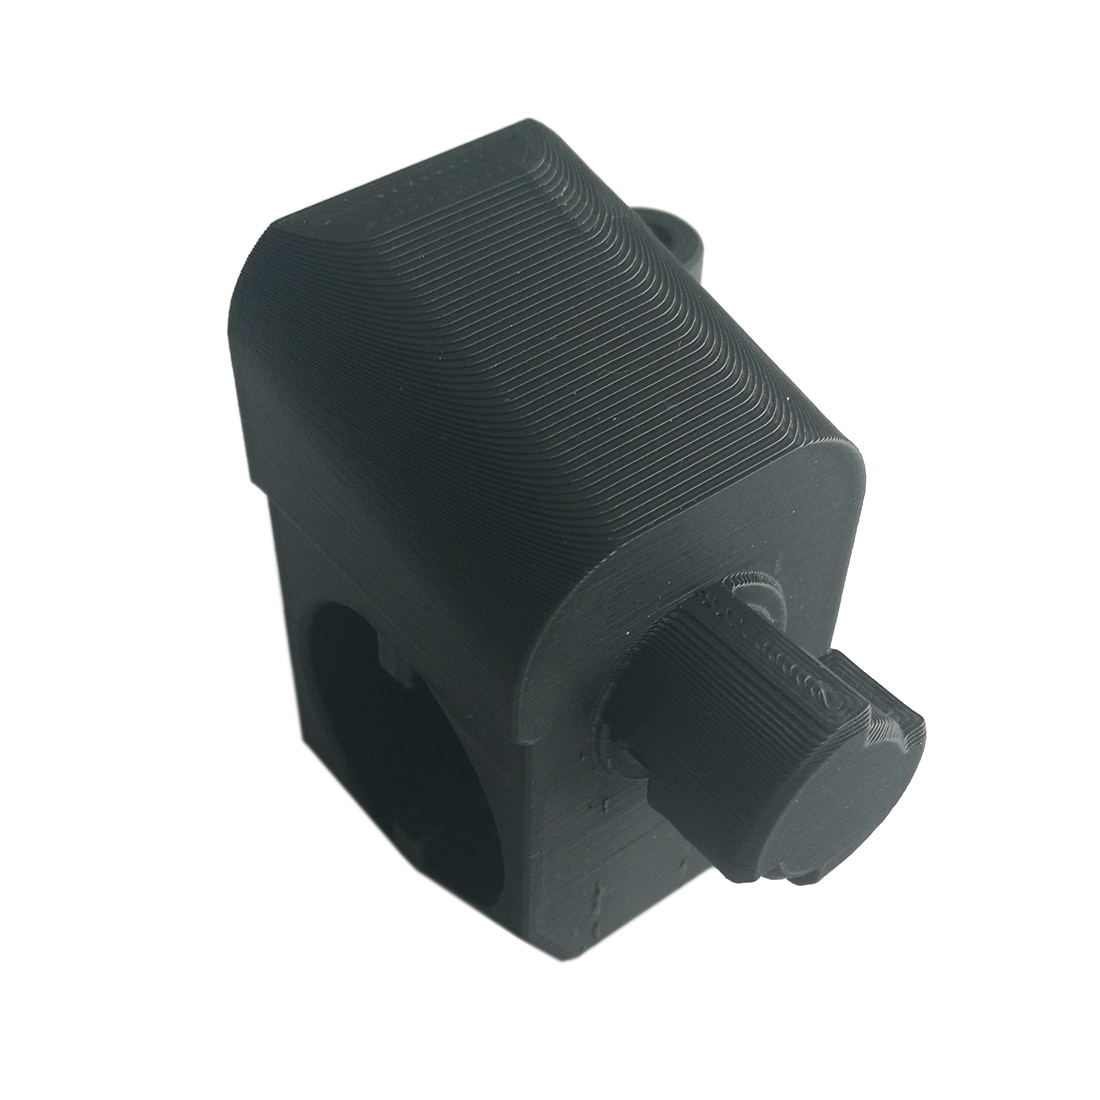 Adaptador de tubo amortiguador DK para receptor Ump45 a JM Gen.8 tubo amortiguador trasero